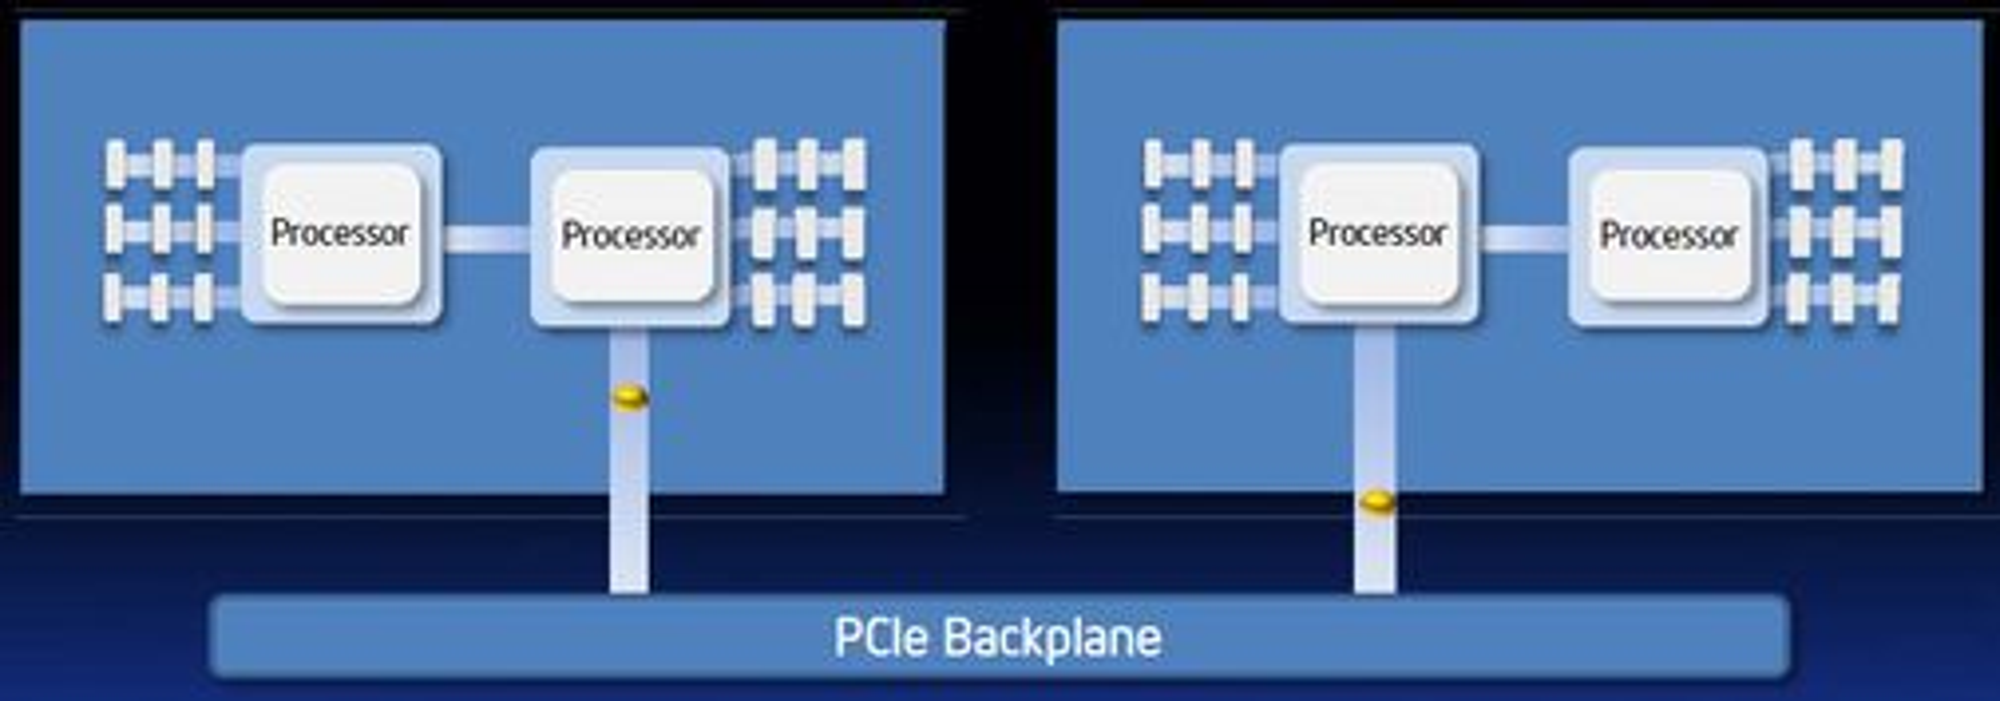 PCI Express brokobling mellom separate prosessorsystemer.